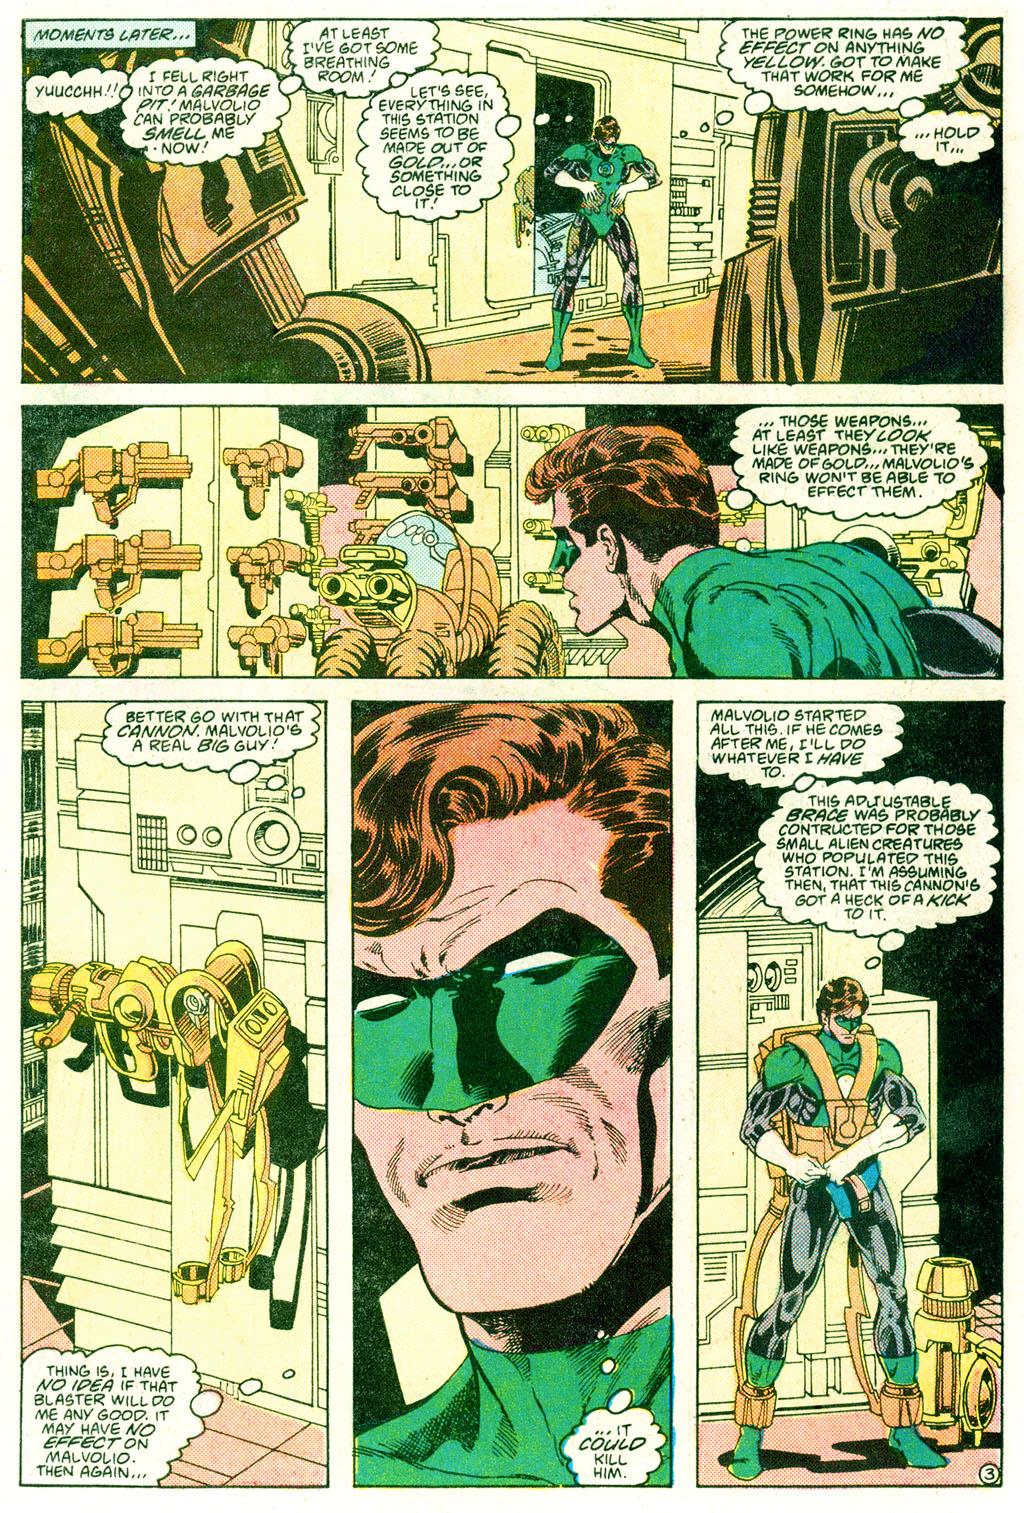 Action Comics (1938) 635 Page 34